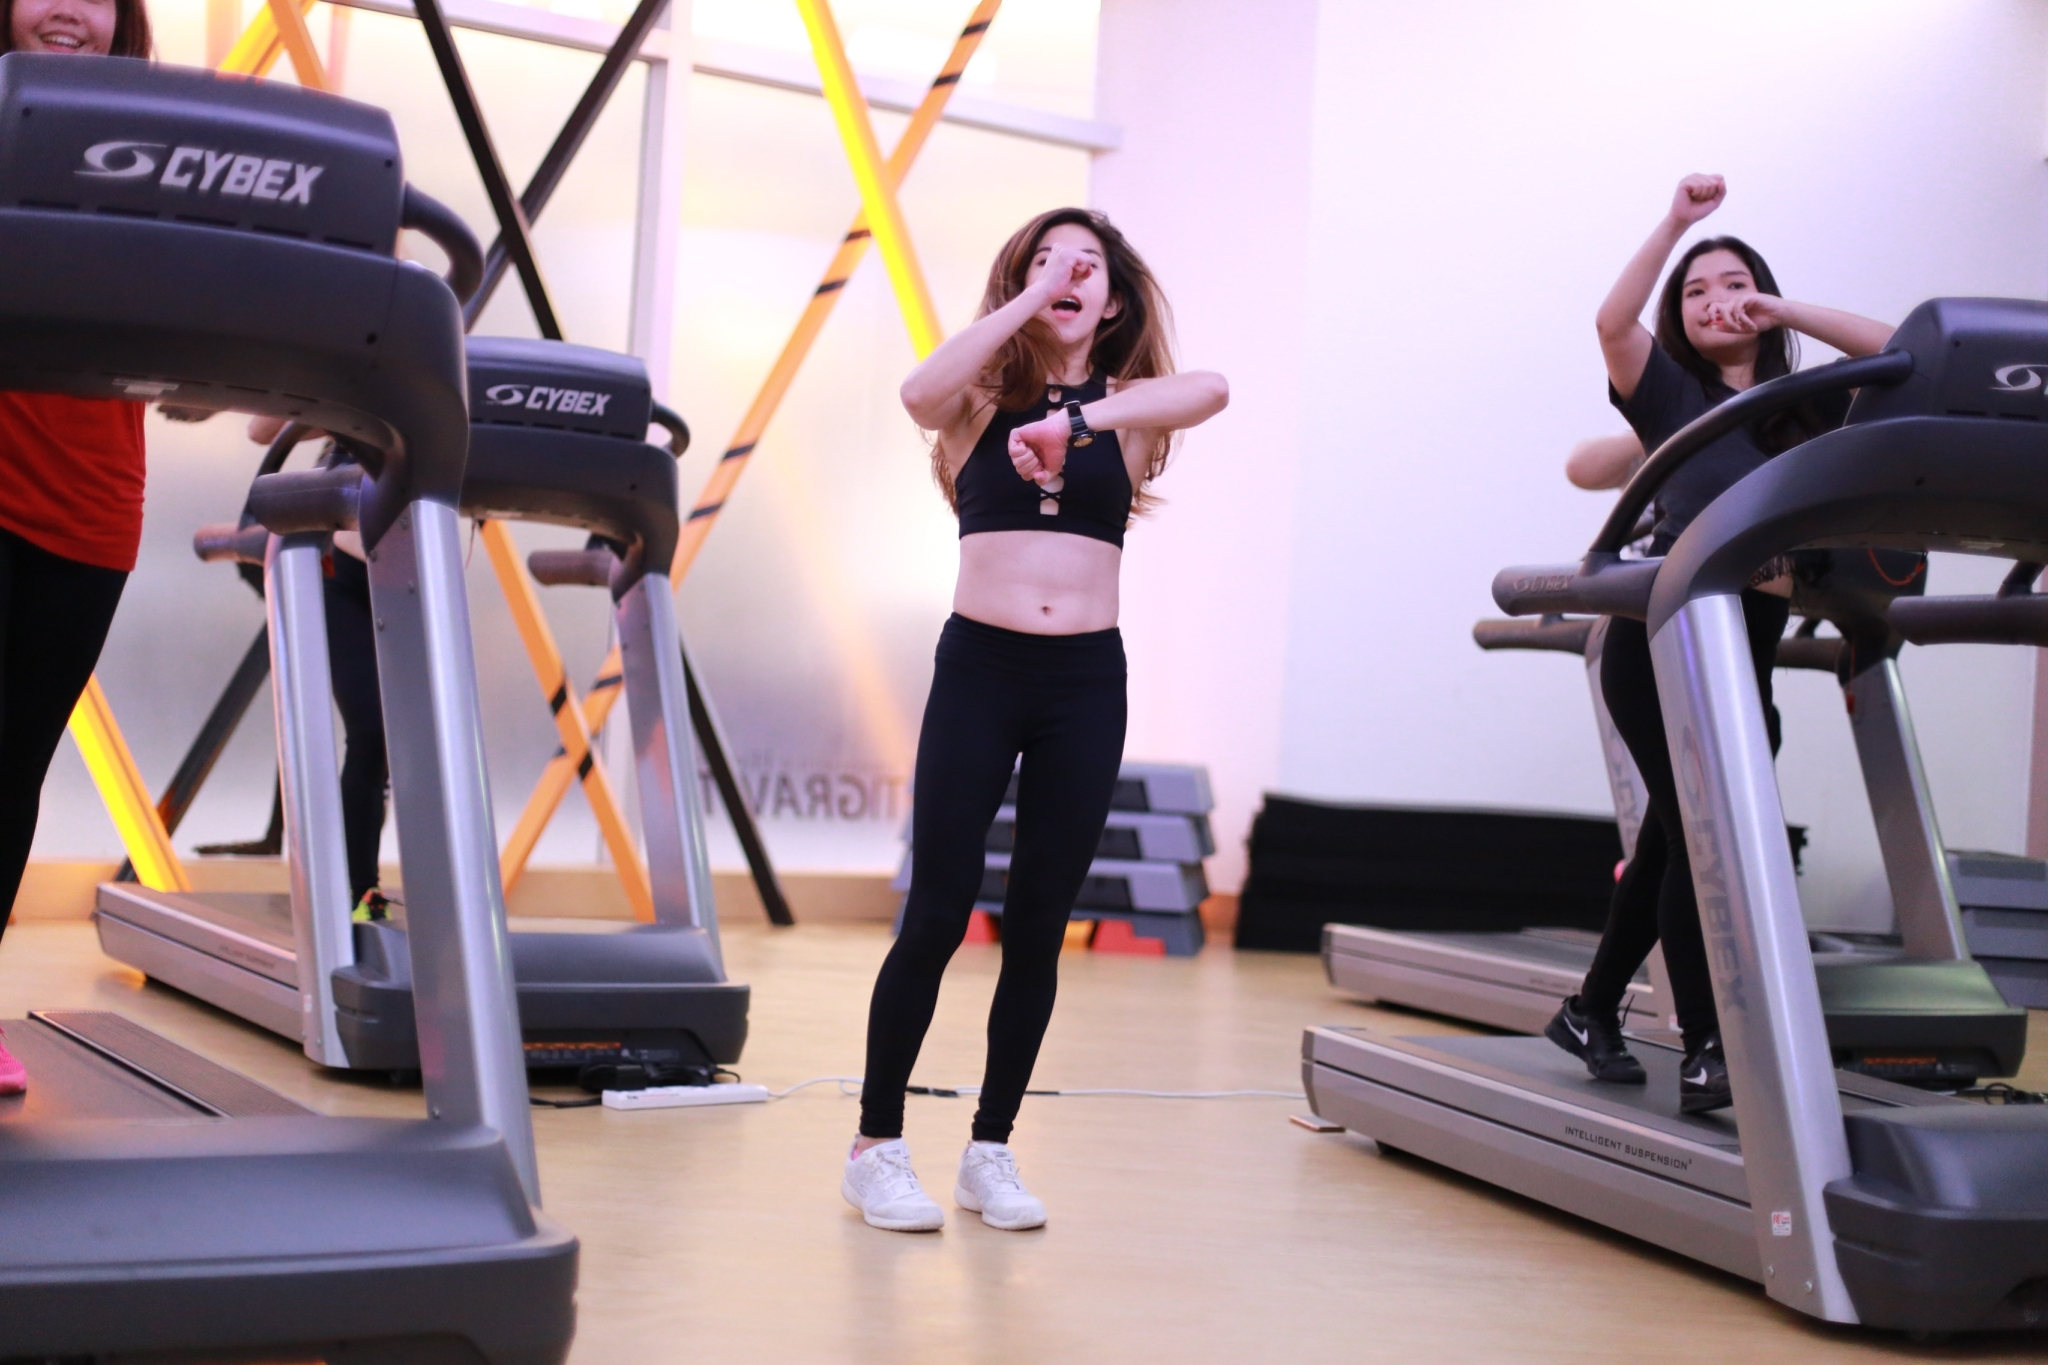 Treadmill Dance Special Class - WE Fitness สาขาเอสพลานาดรัชดา